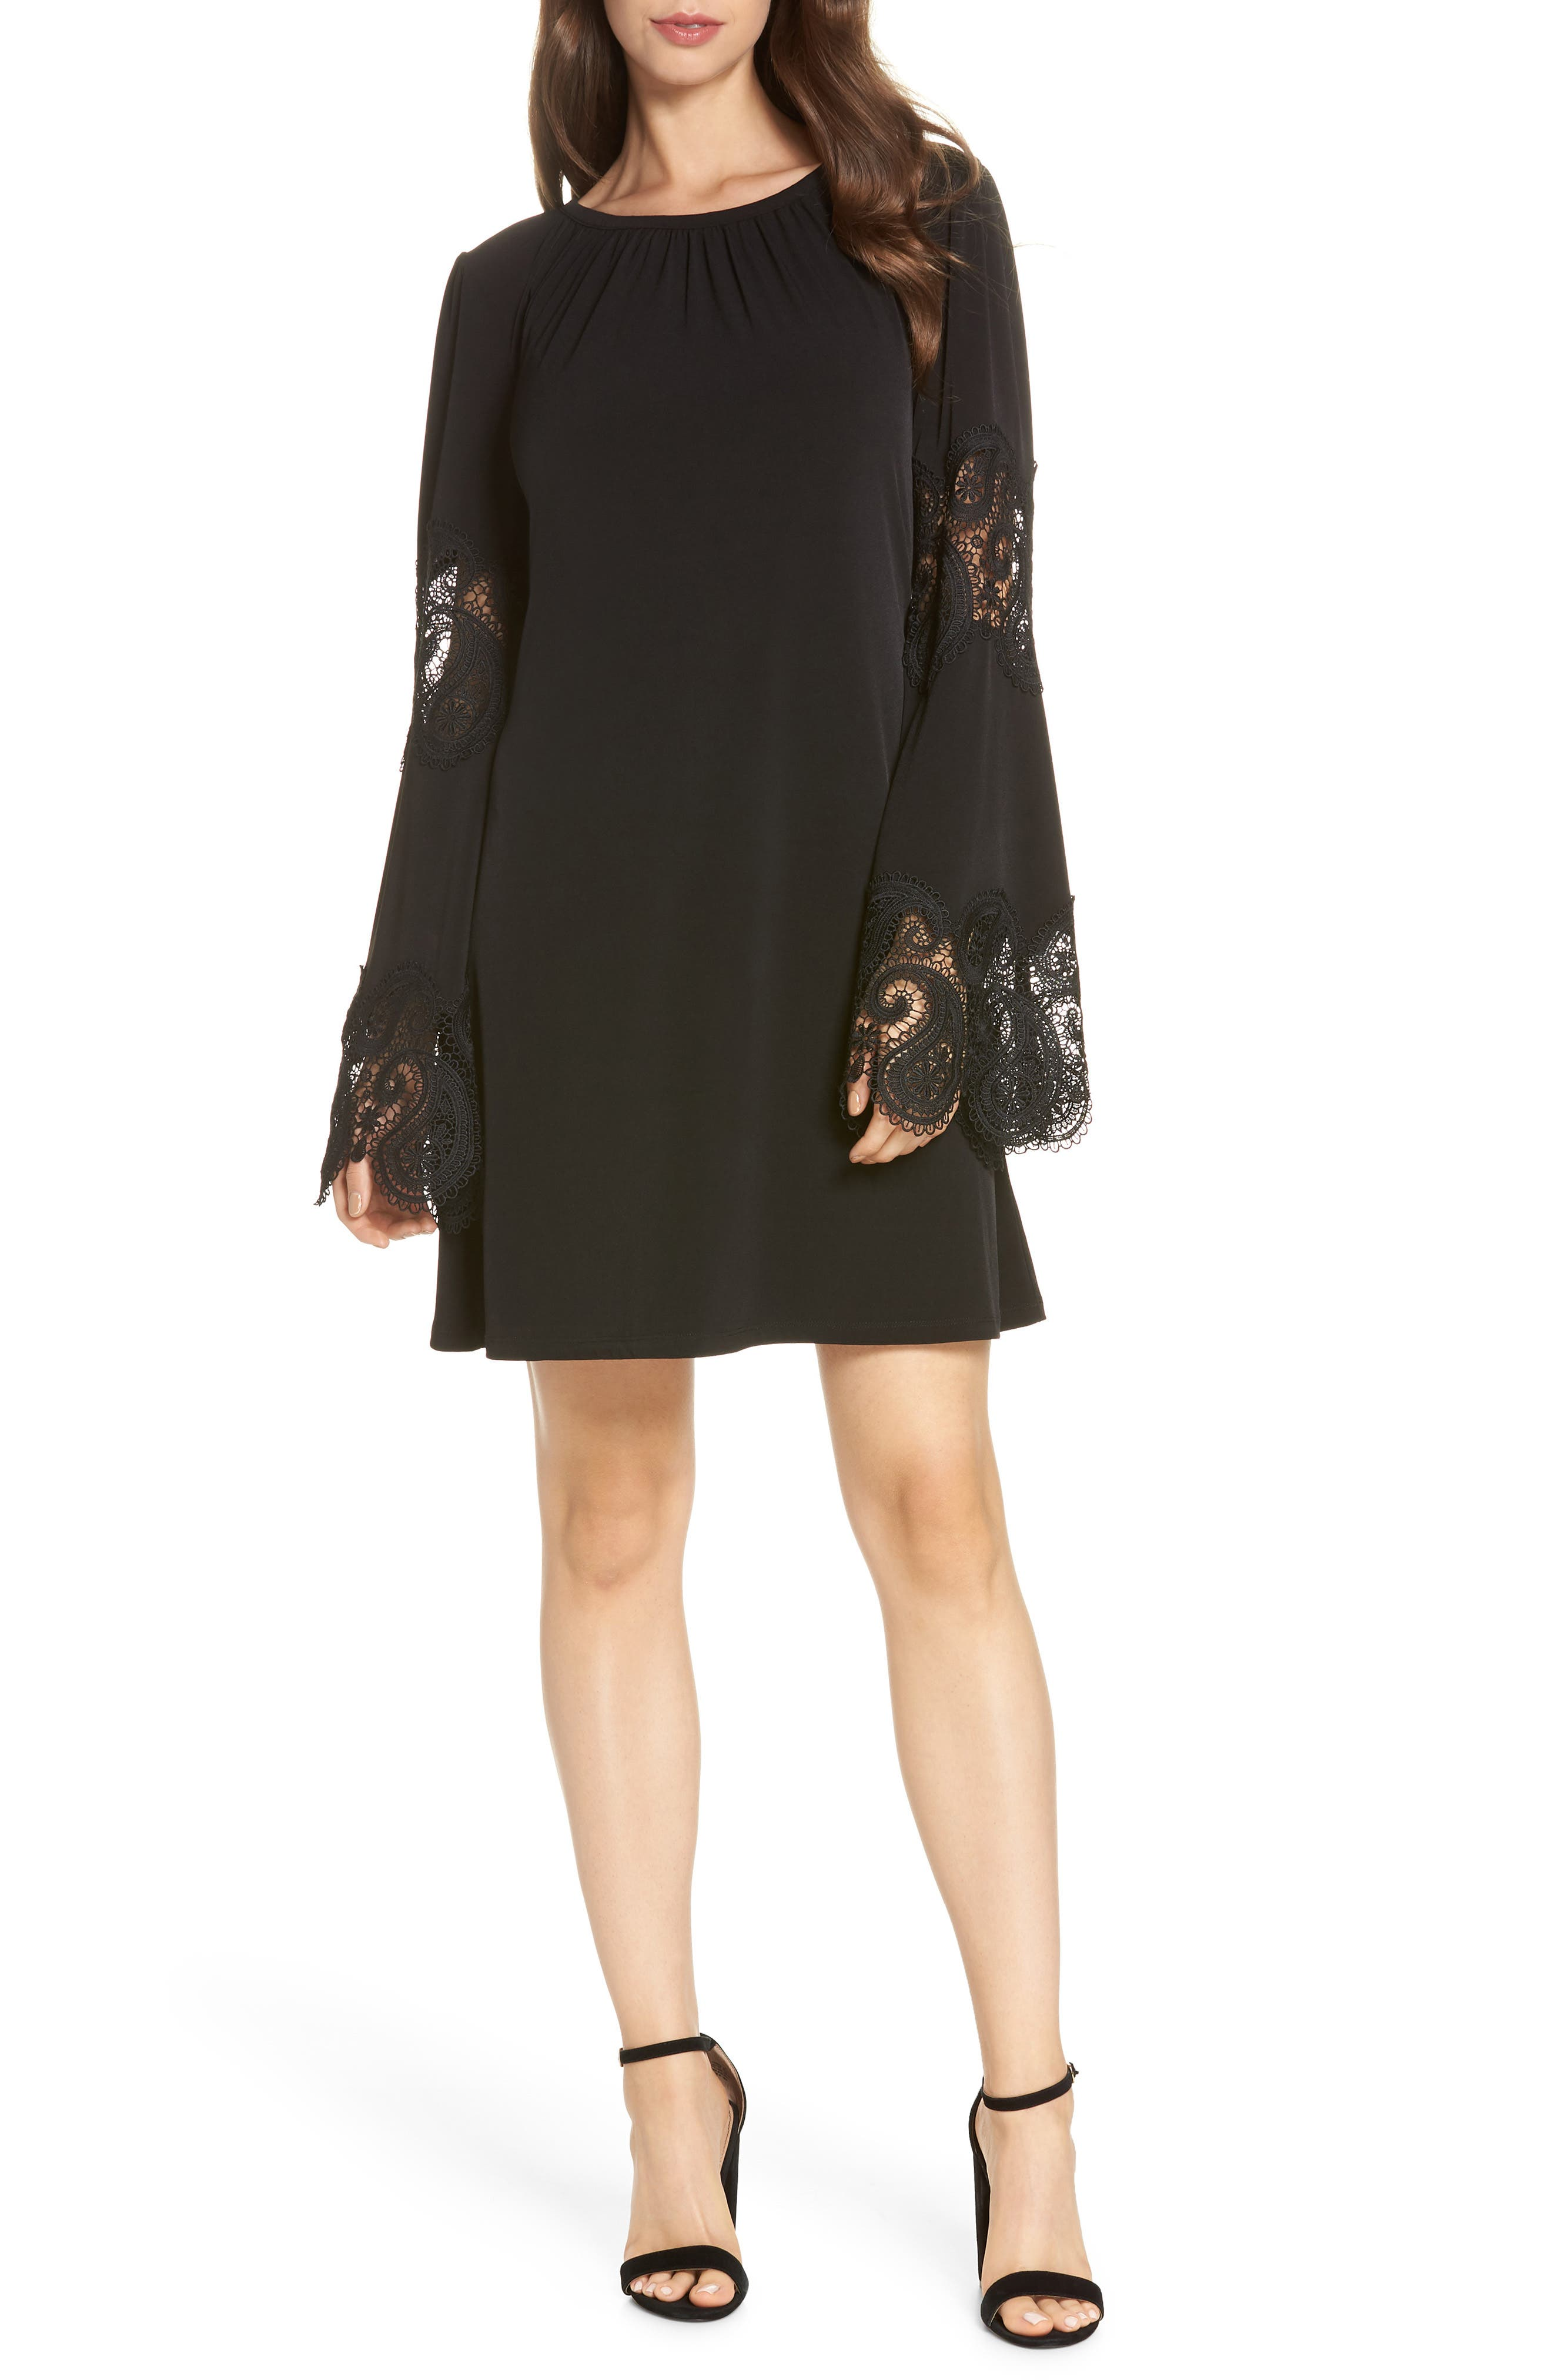 MICHAEL MICHAEL KORS,                             Lace Inset Bell Sleeve Shift Dress,                             Main thumbnail 1, color,                             001